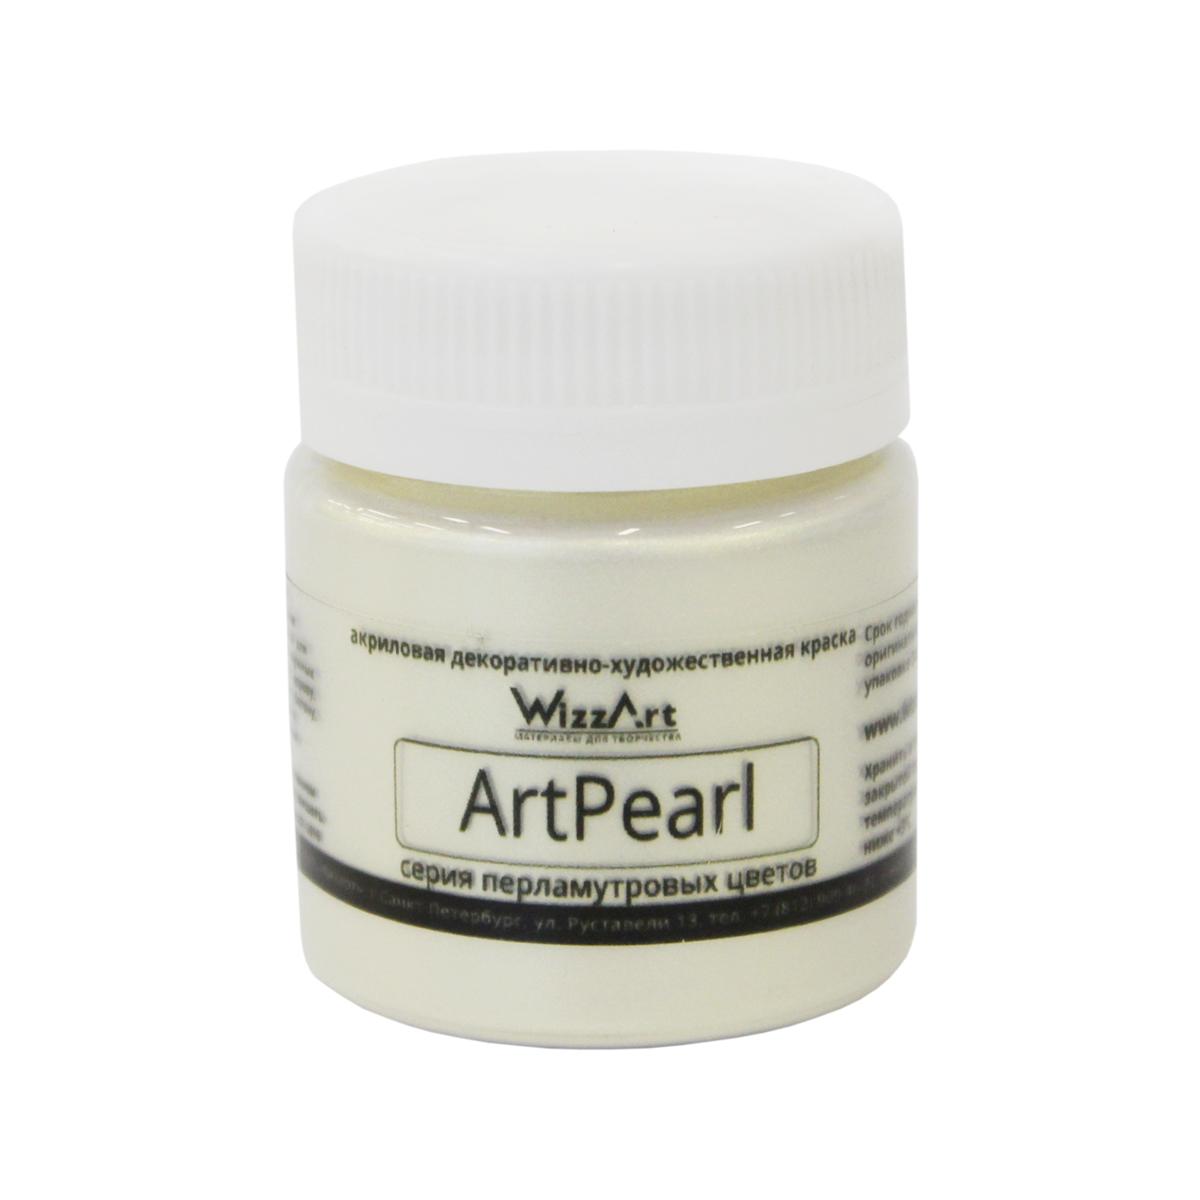 Краска акриловая Wizzart ArtPearl. Хамелеон, цвет: желтый, 40 мл551587